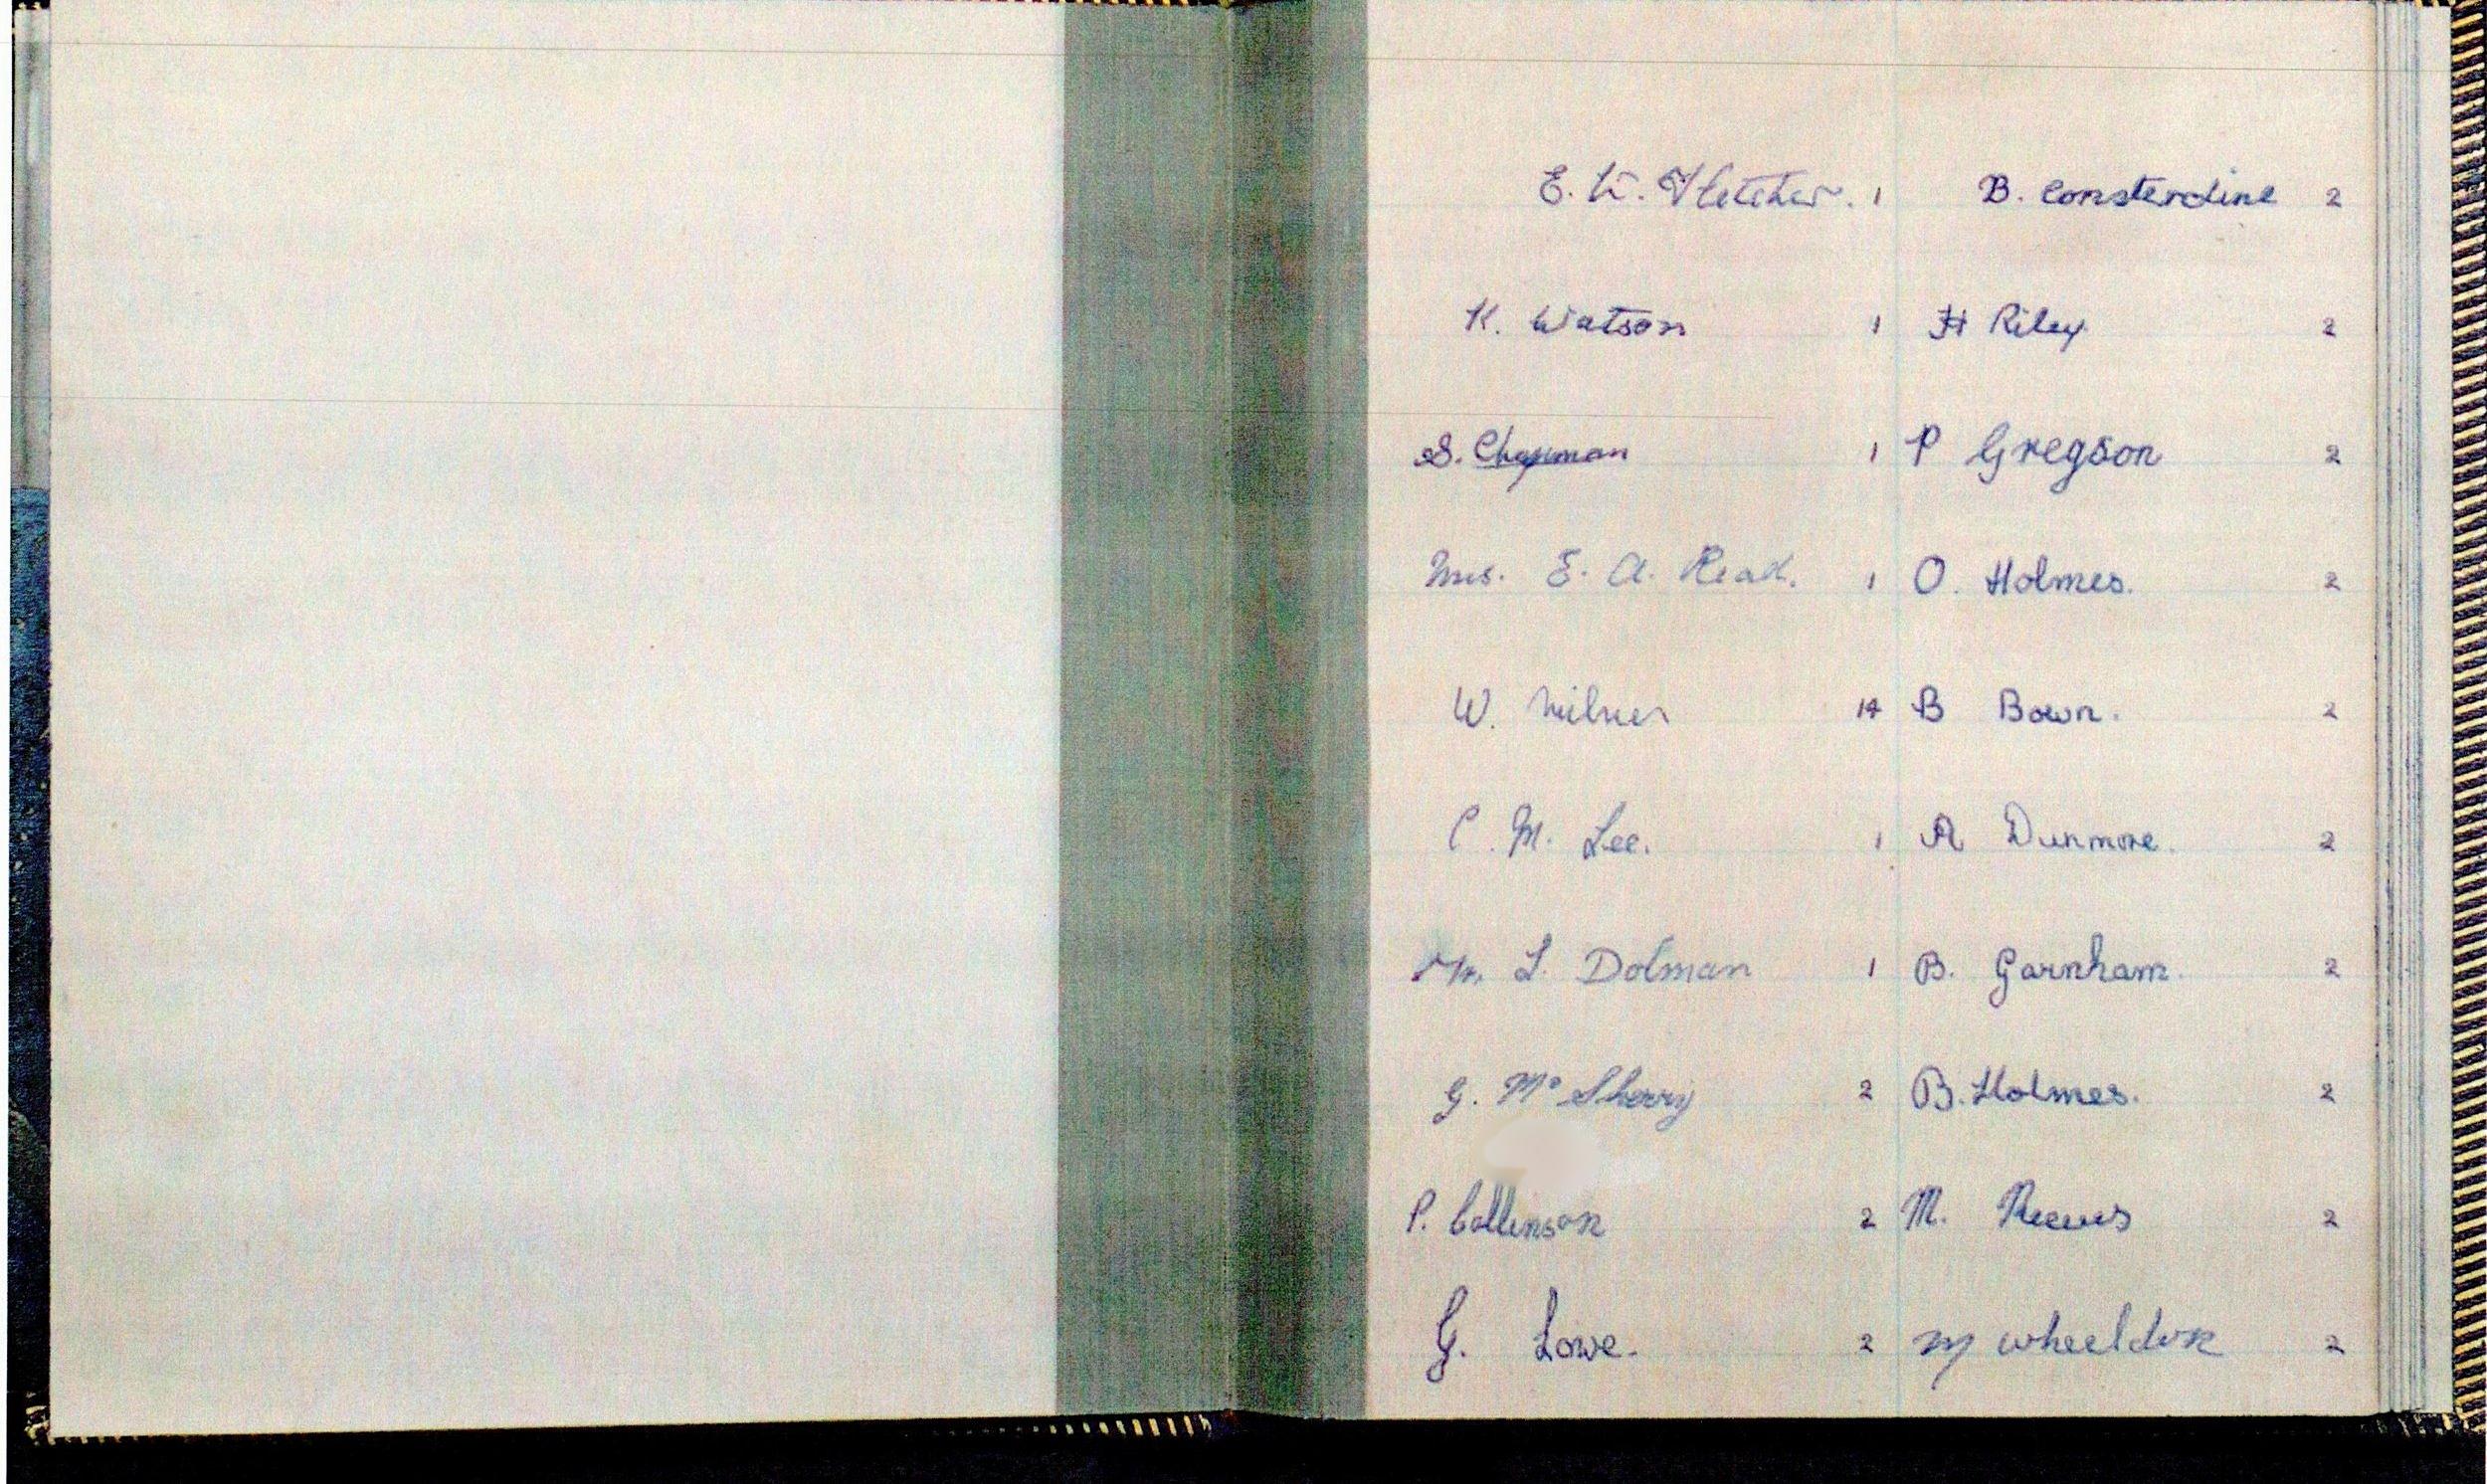 royal-crown-derby-harold-robinson-70th-birthday-book-page-1